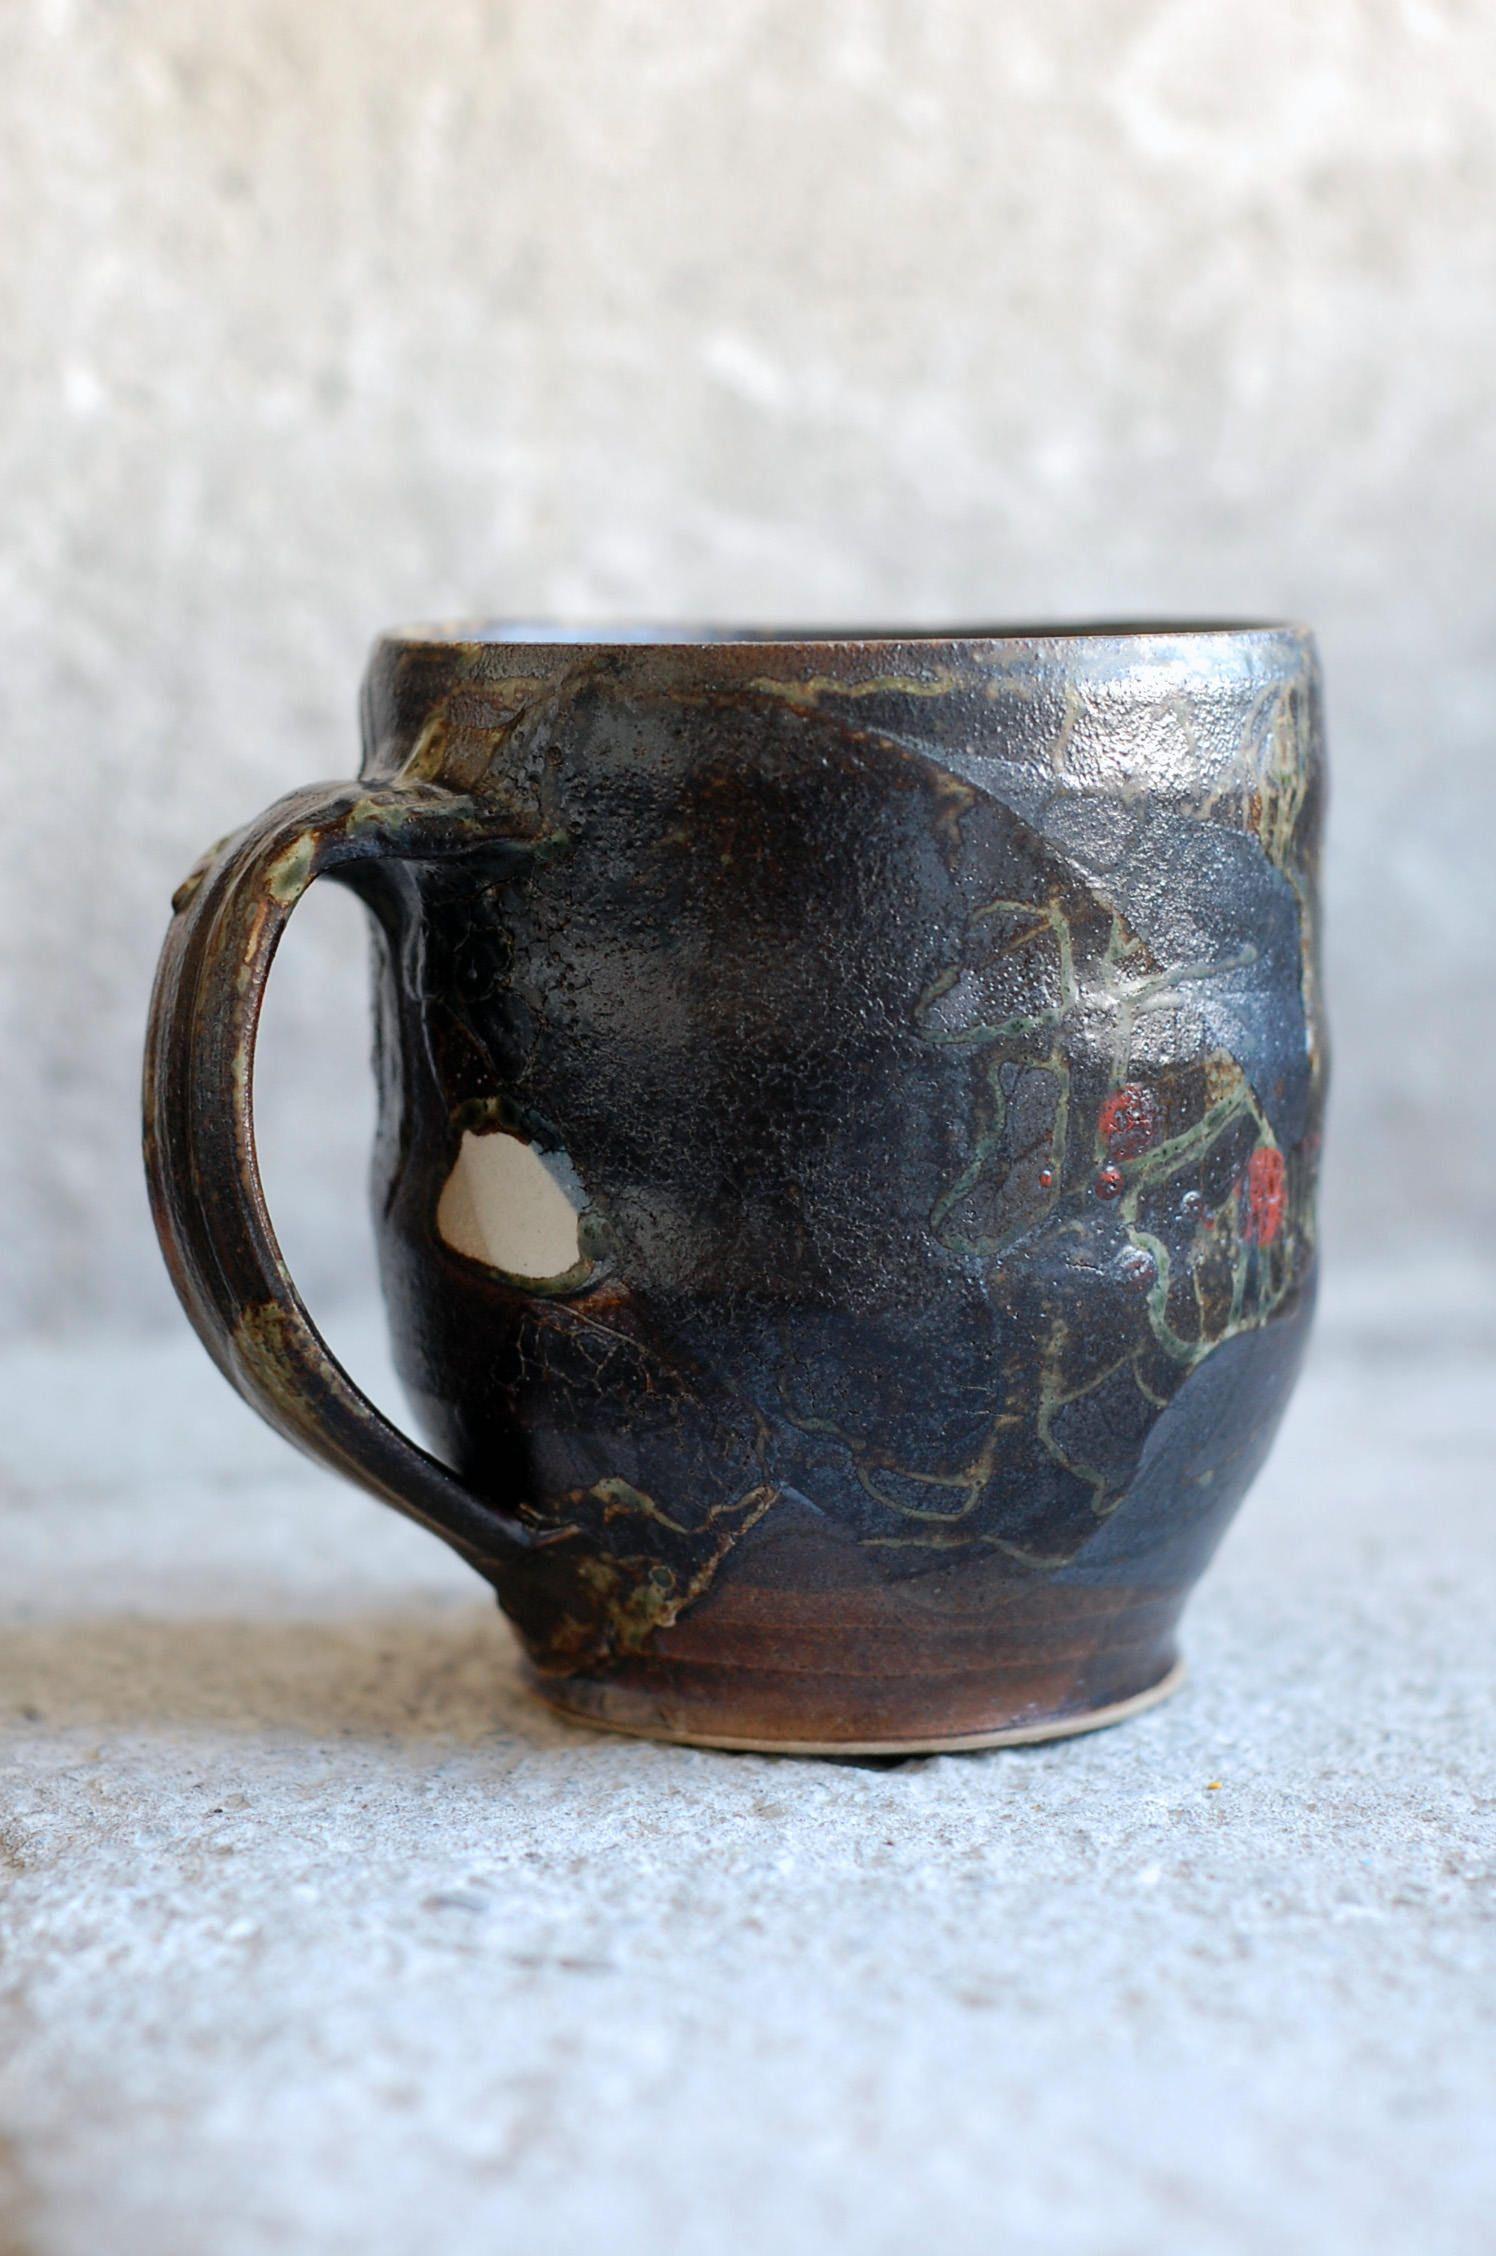 Pin by Ralph Nuara on shameless Stoneware mugs, Tea mugs